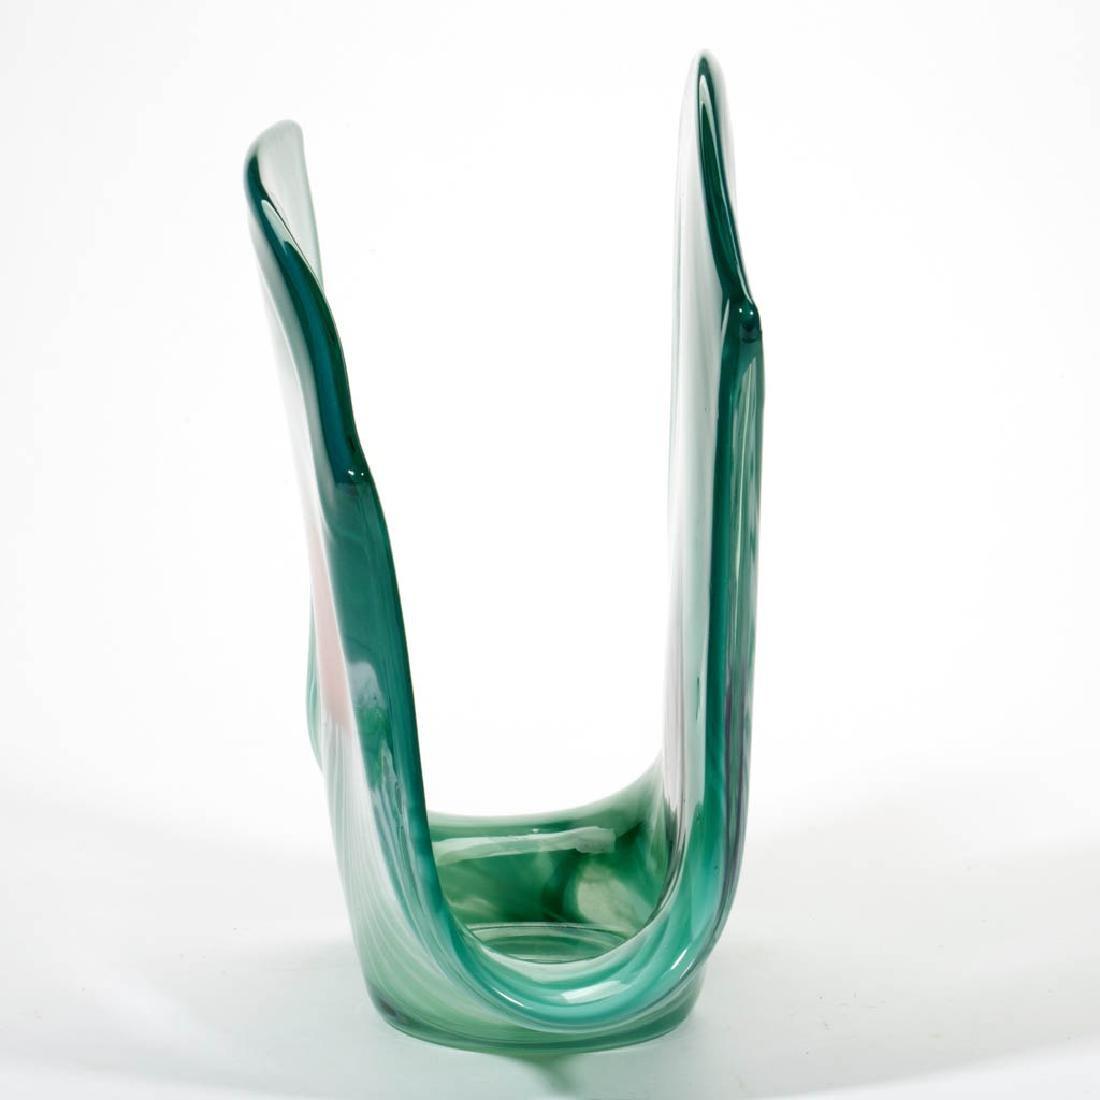 UNIDENTIFIED STUDIO ART GLASS SCULPTURE - 2